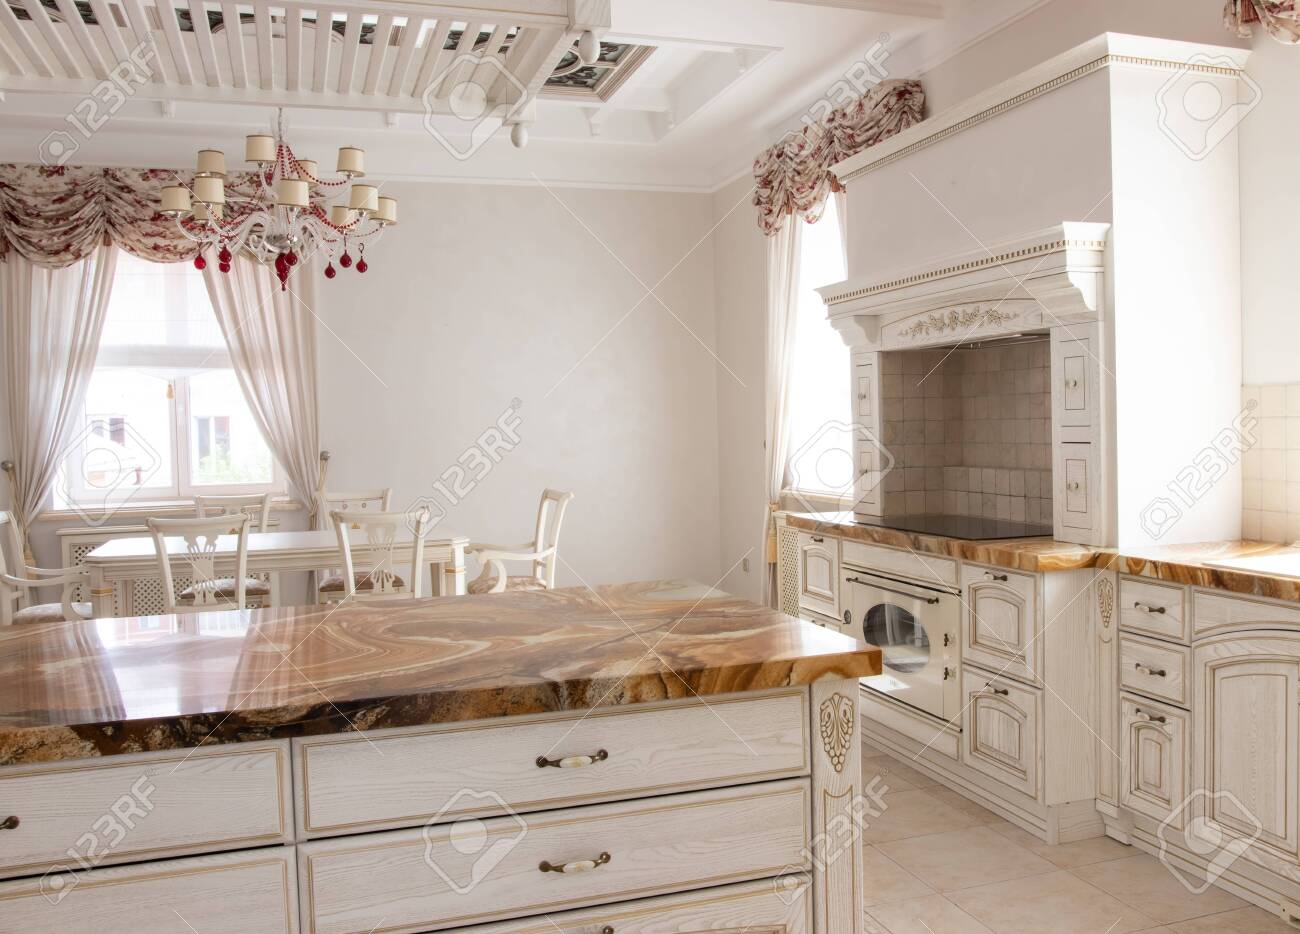 beautiful interior of the kitchen area - 135513899